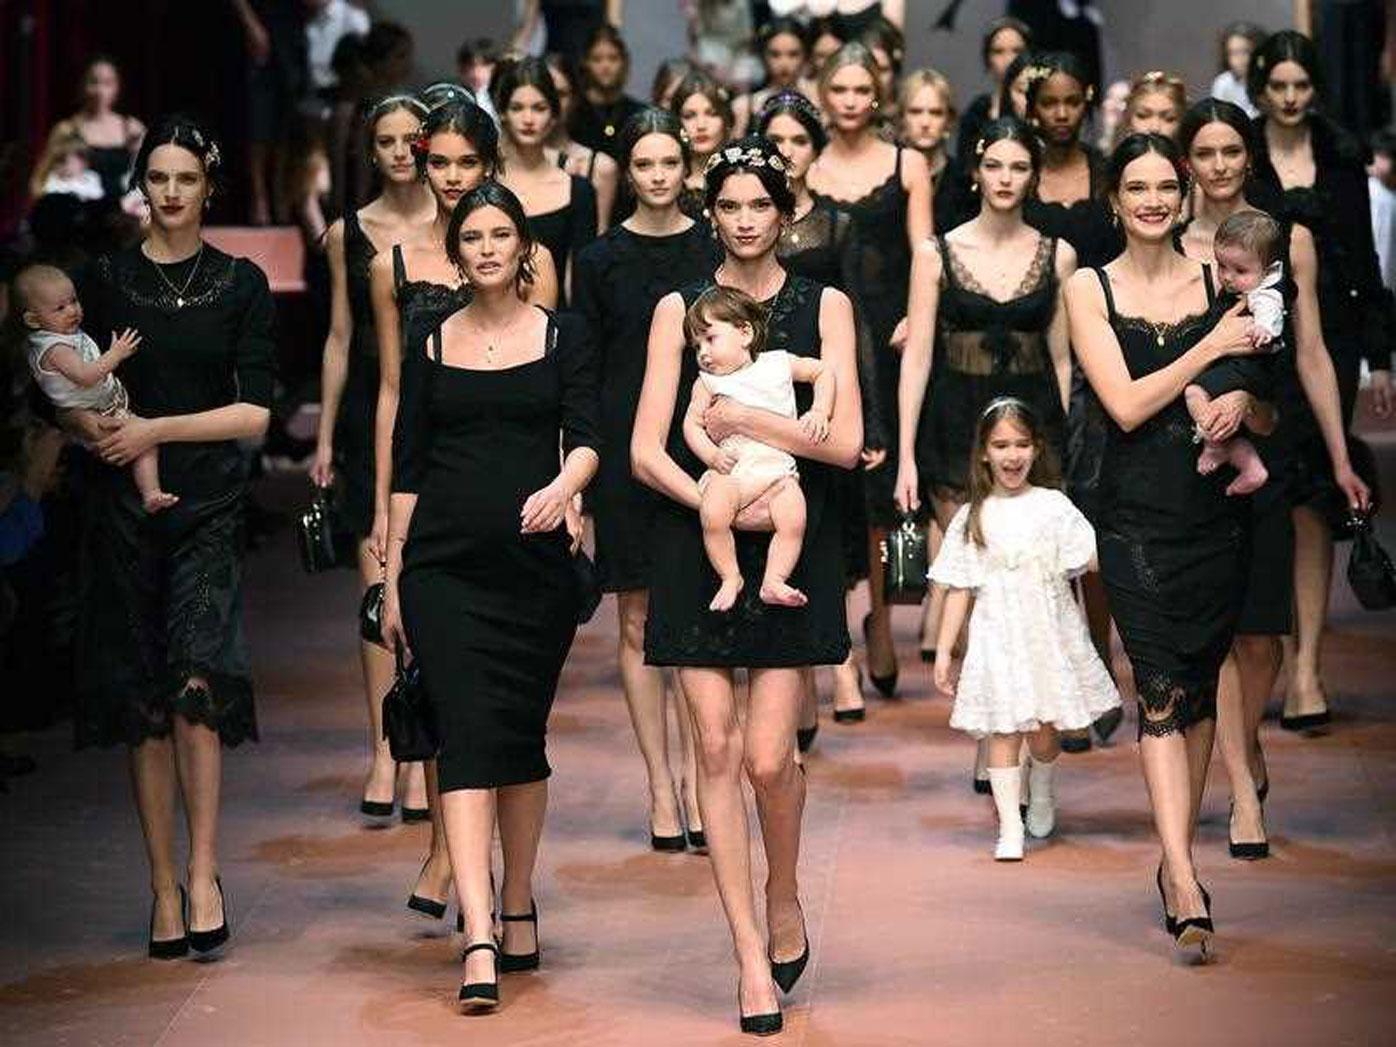 Dolce & Gabbana's 'Viva la Mamma' show